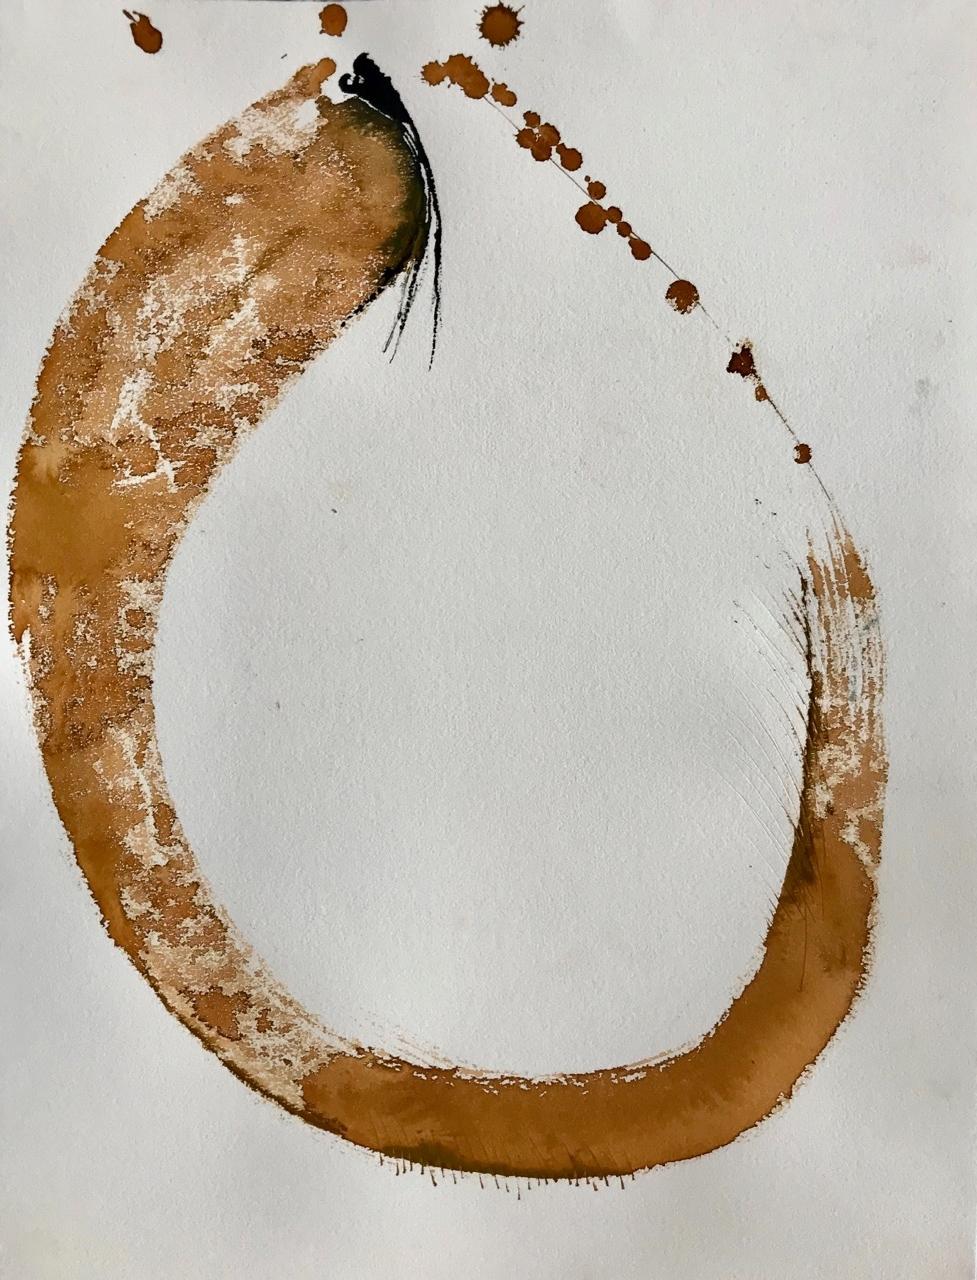 Bananana, Pt.4, Aquarell und Tusche auf Papier, 46 x 61 cm, 2018